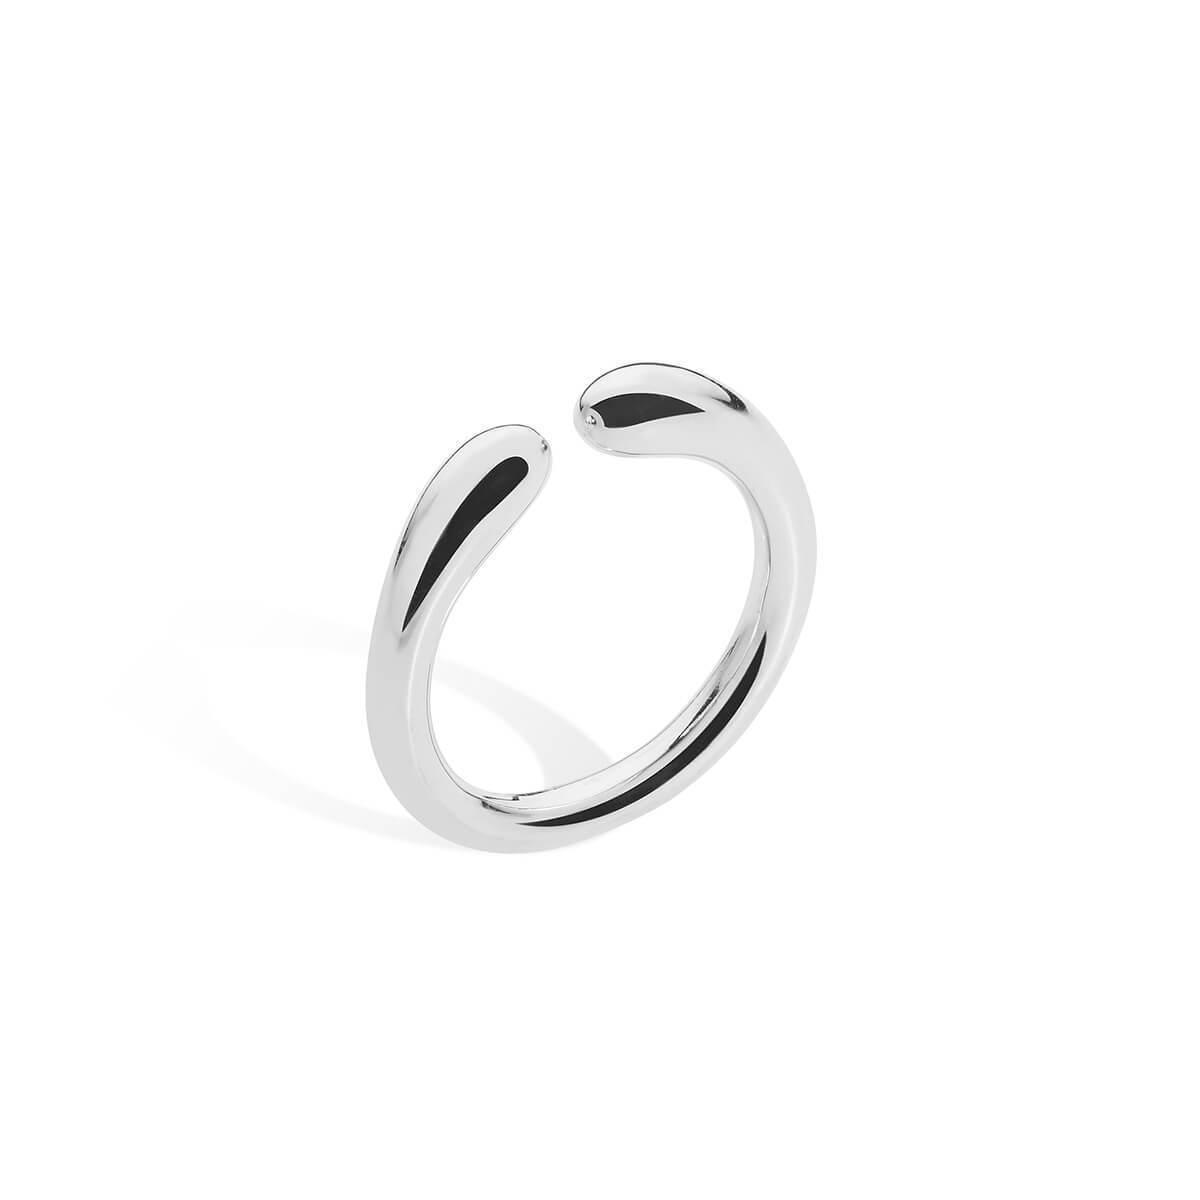 Lucy Quartermaine Midi Ring With Drop - UK G - US 3 3/8 - EU 45 1/4 bgwROqt